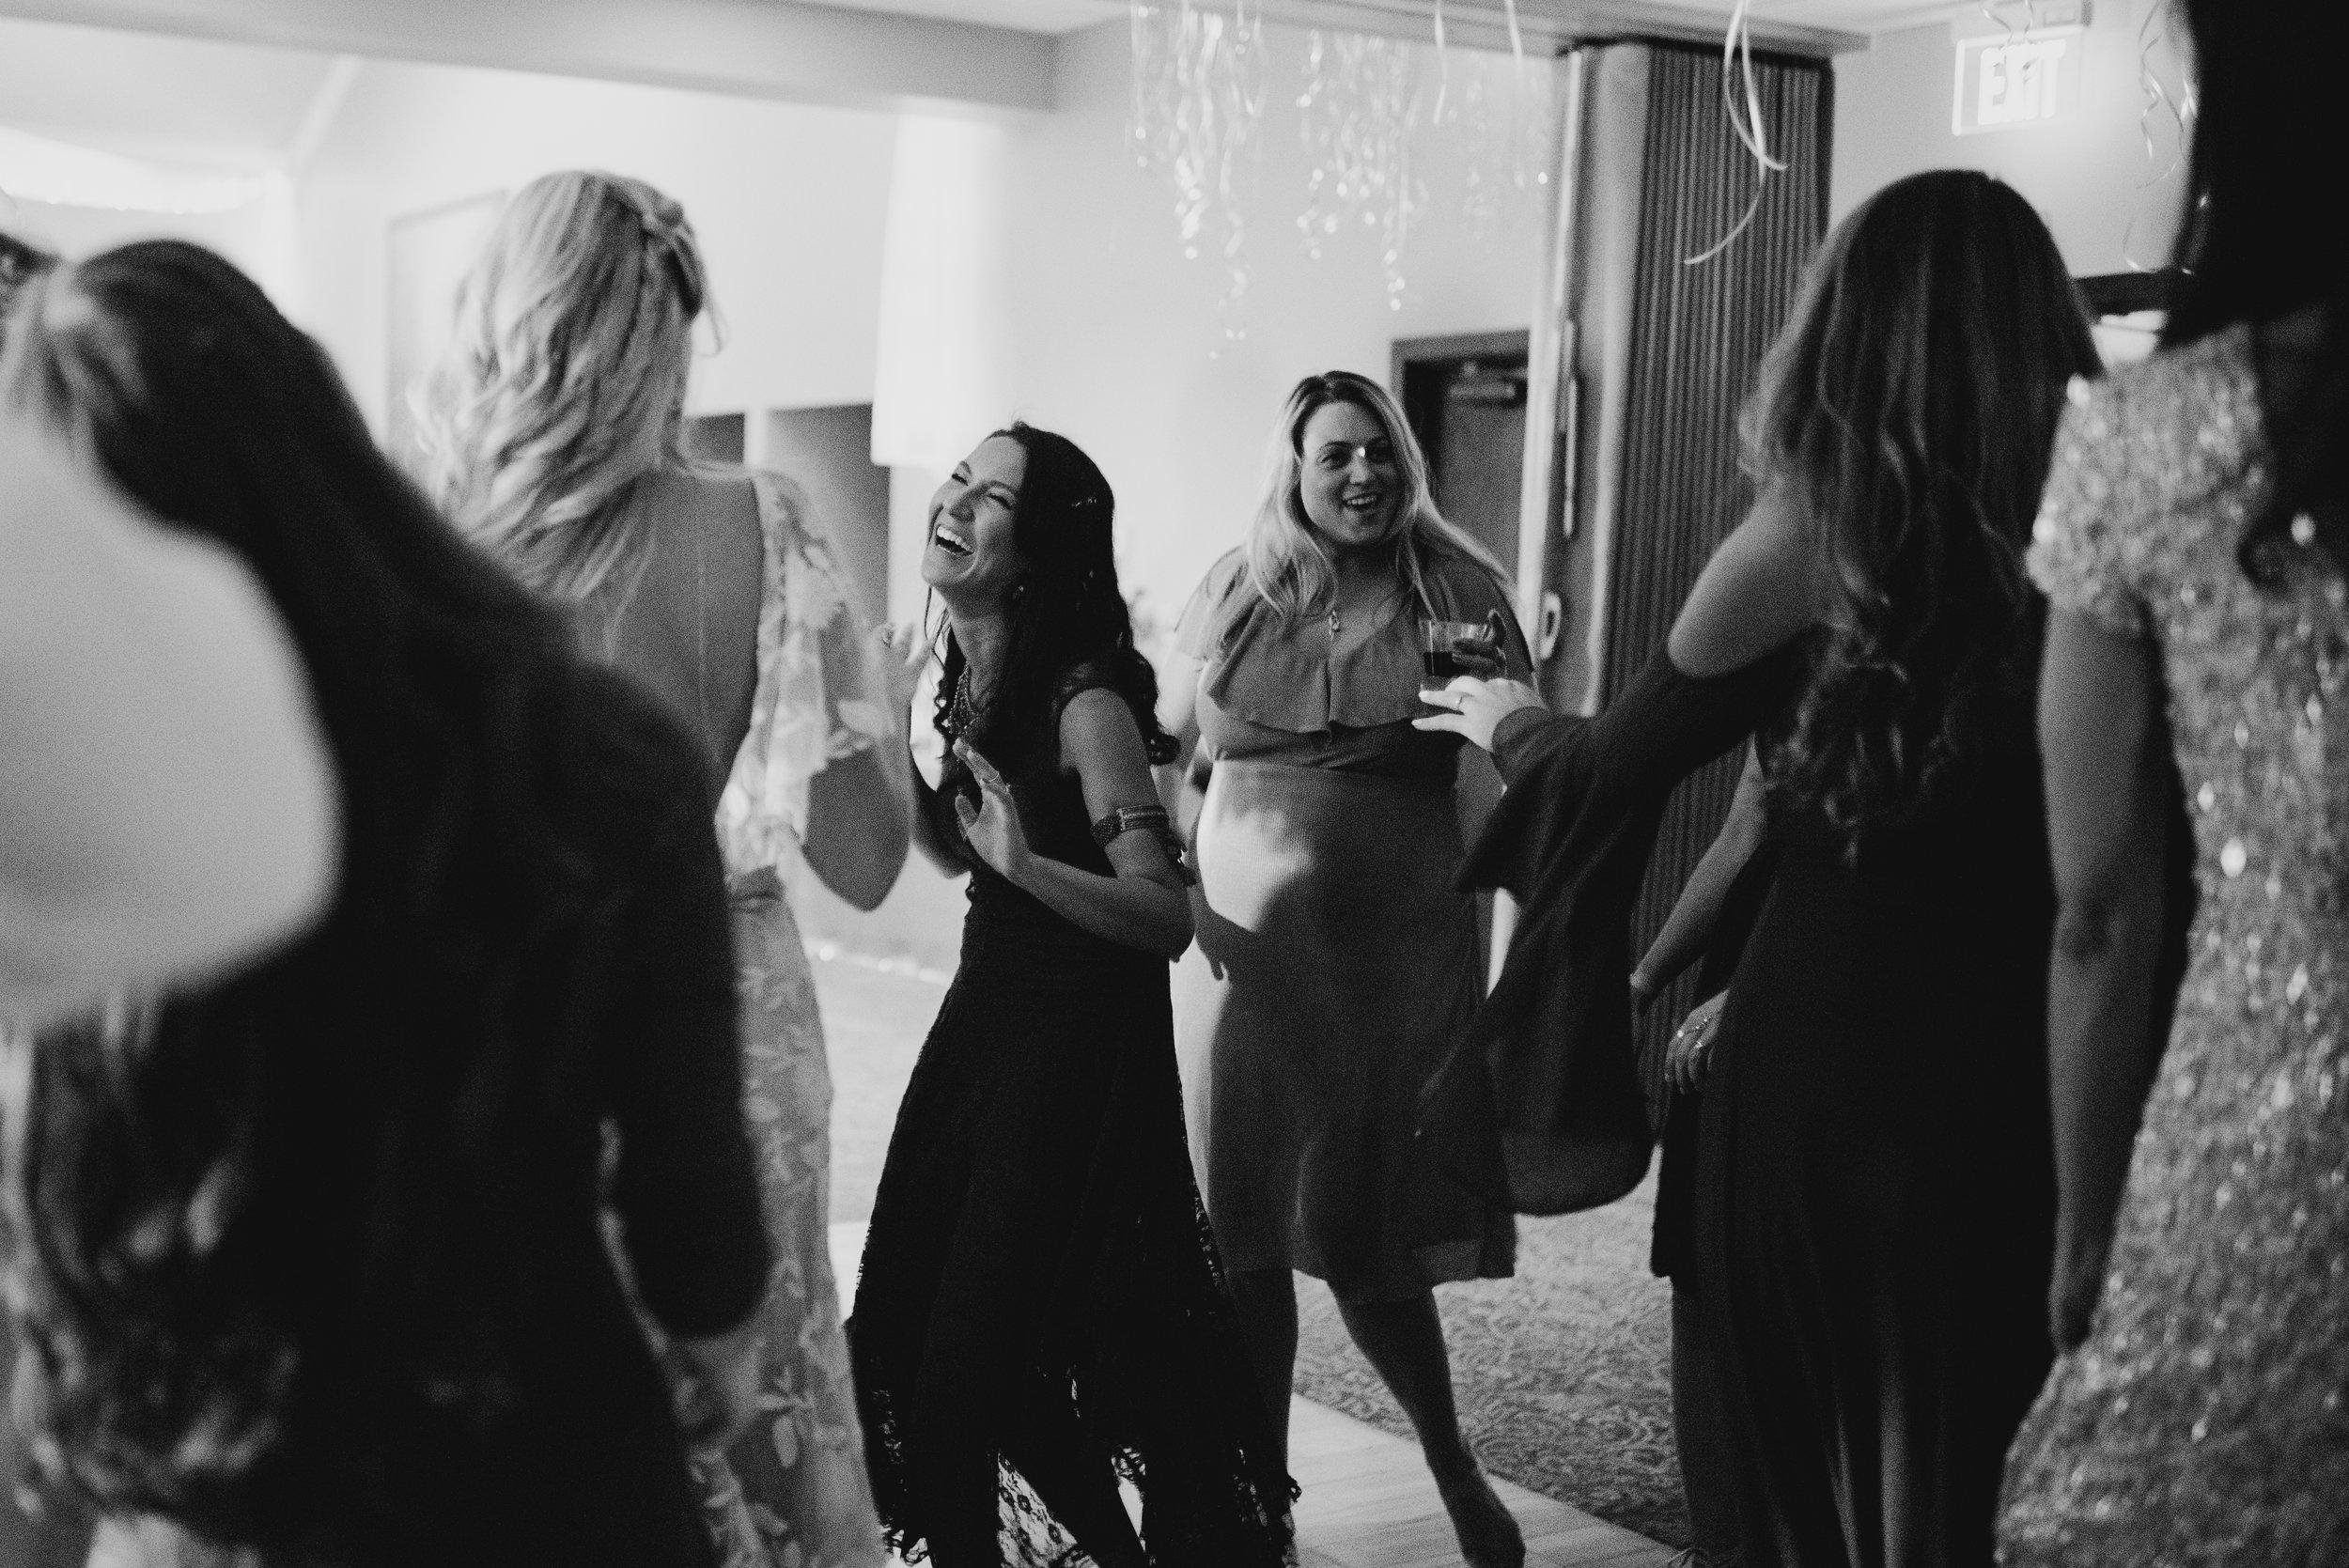 zayda-collin-panama-city-wedding-photography-trippy-bohemian-lisa-frank-wedding-dancing-party-96.jpg